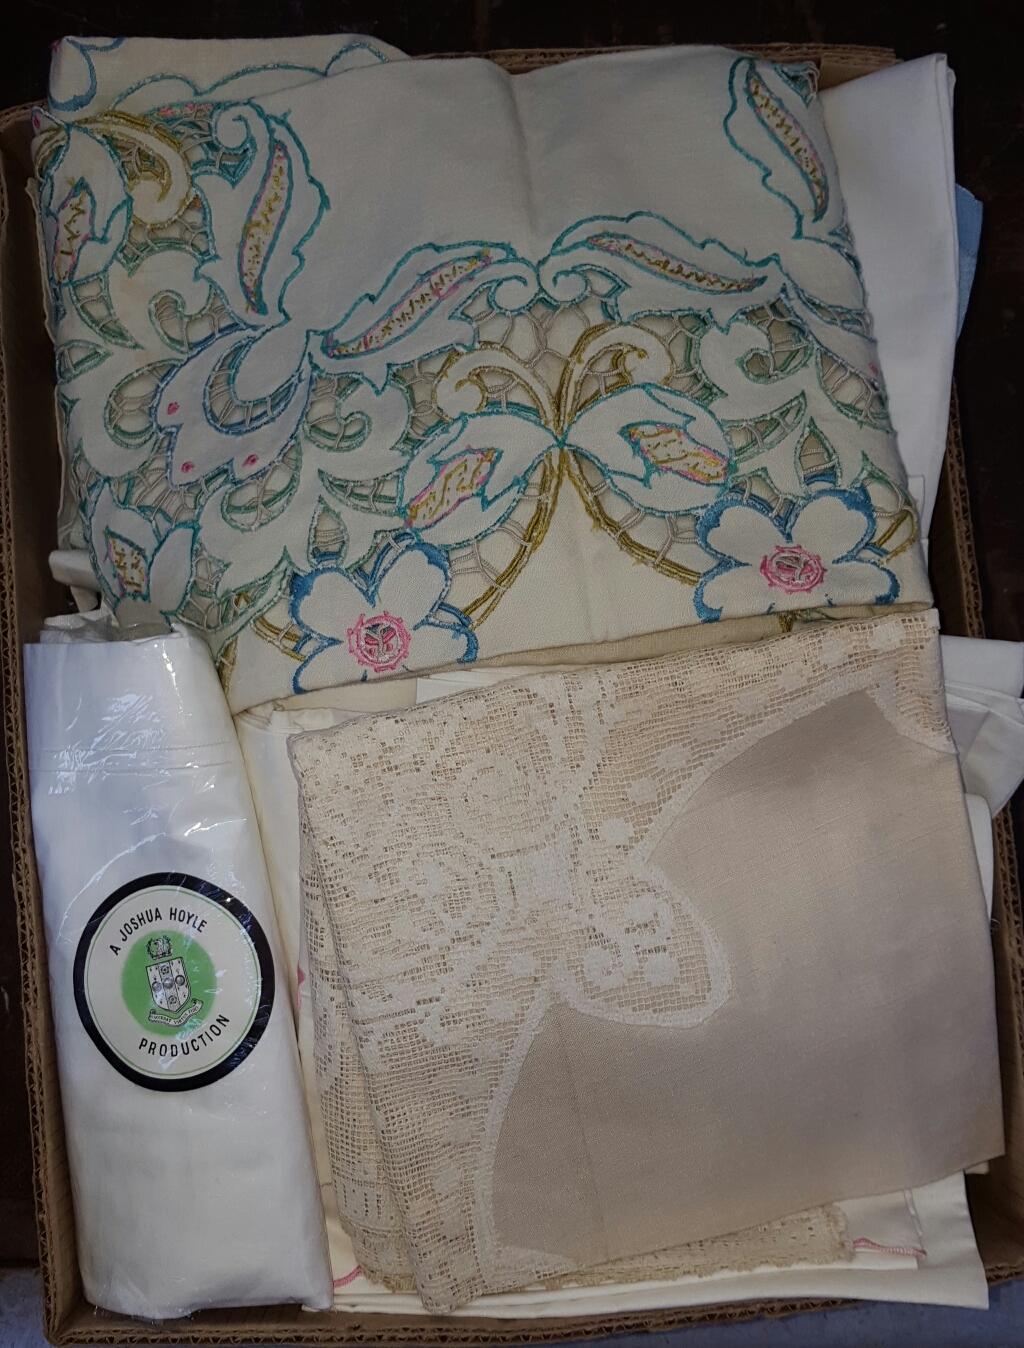 Lot 42 - Box of Linen & Fabrics includes Irish Linen ***reserve reduced***